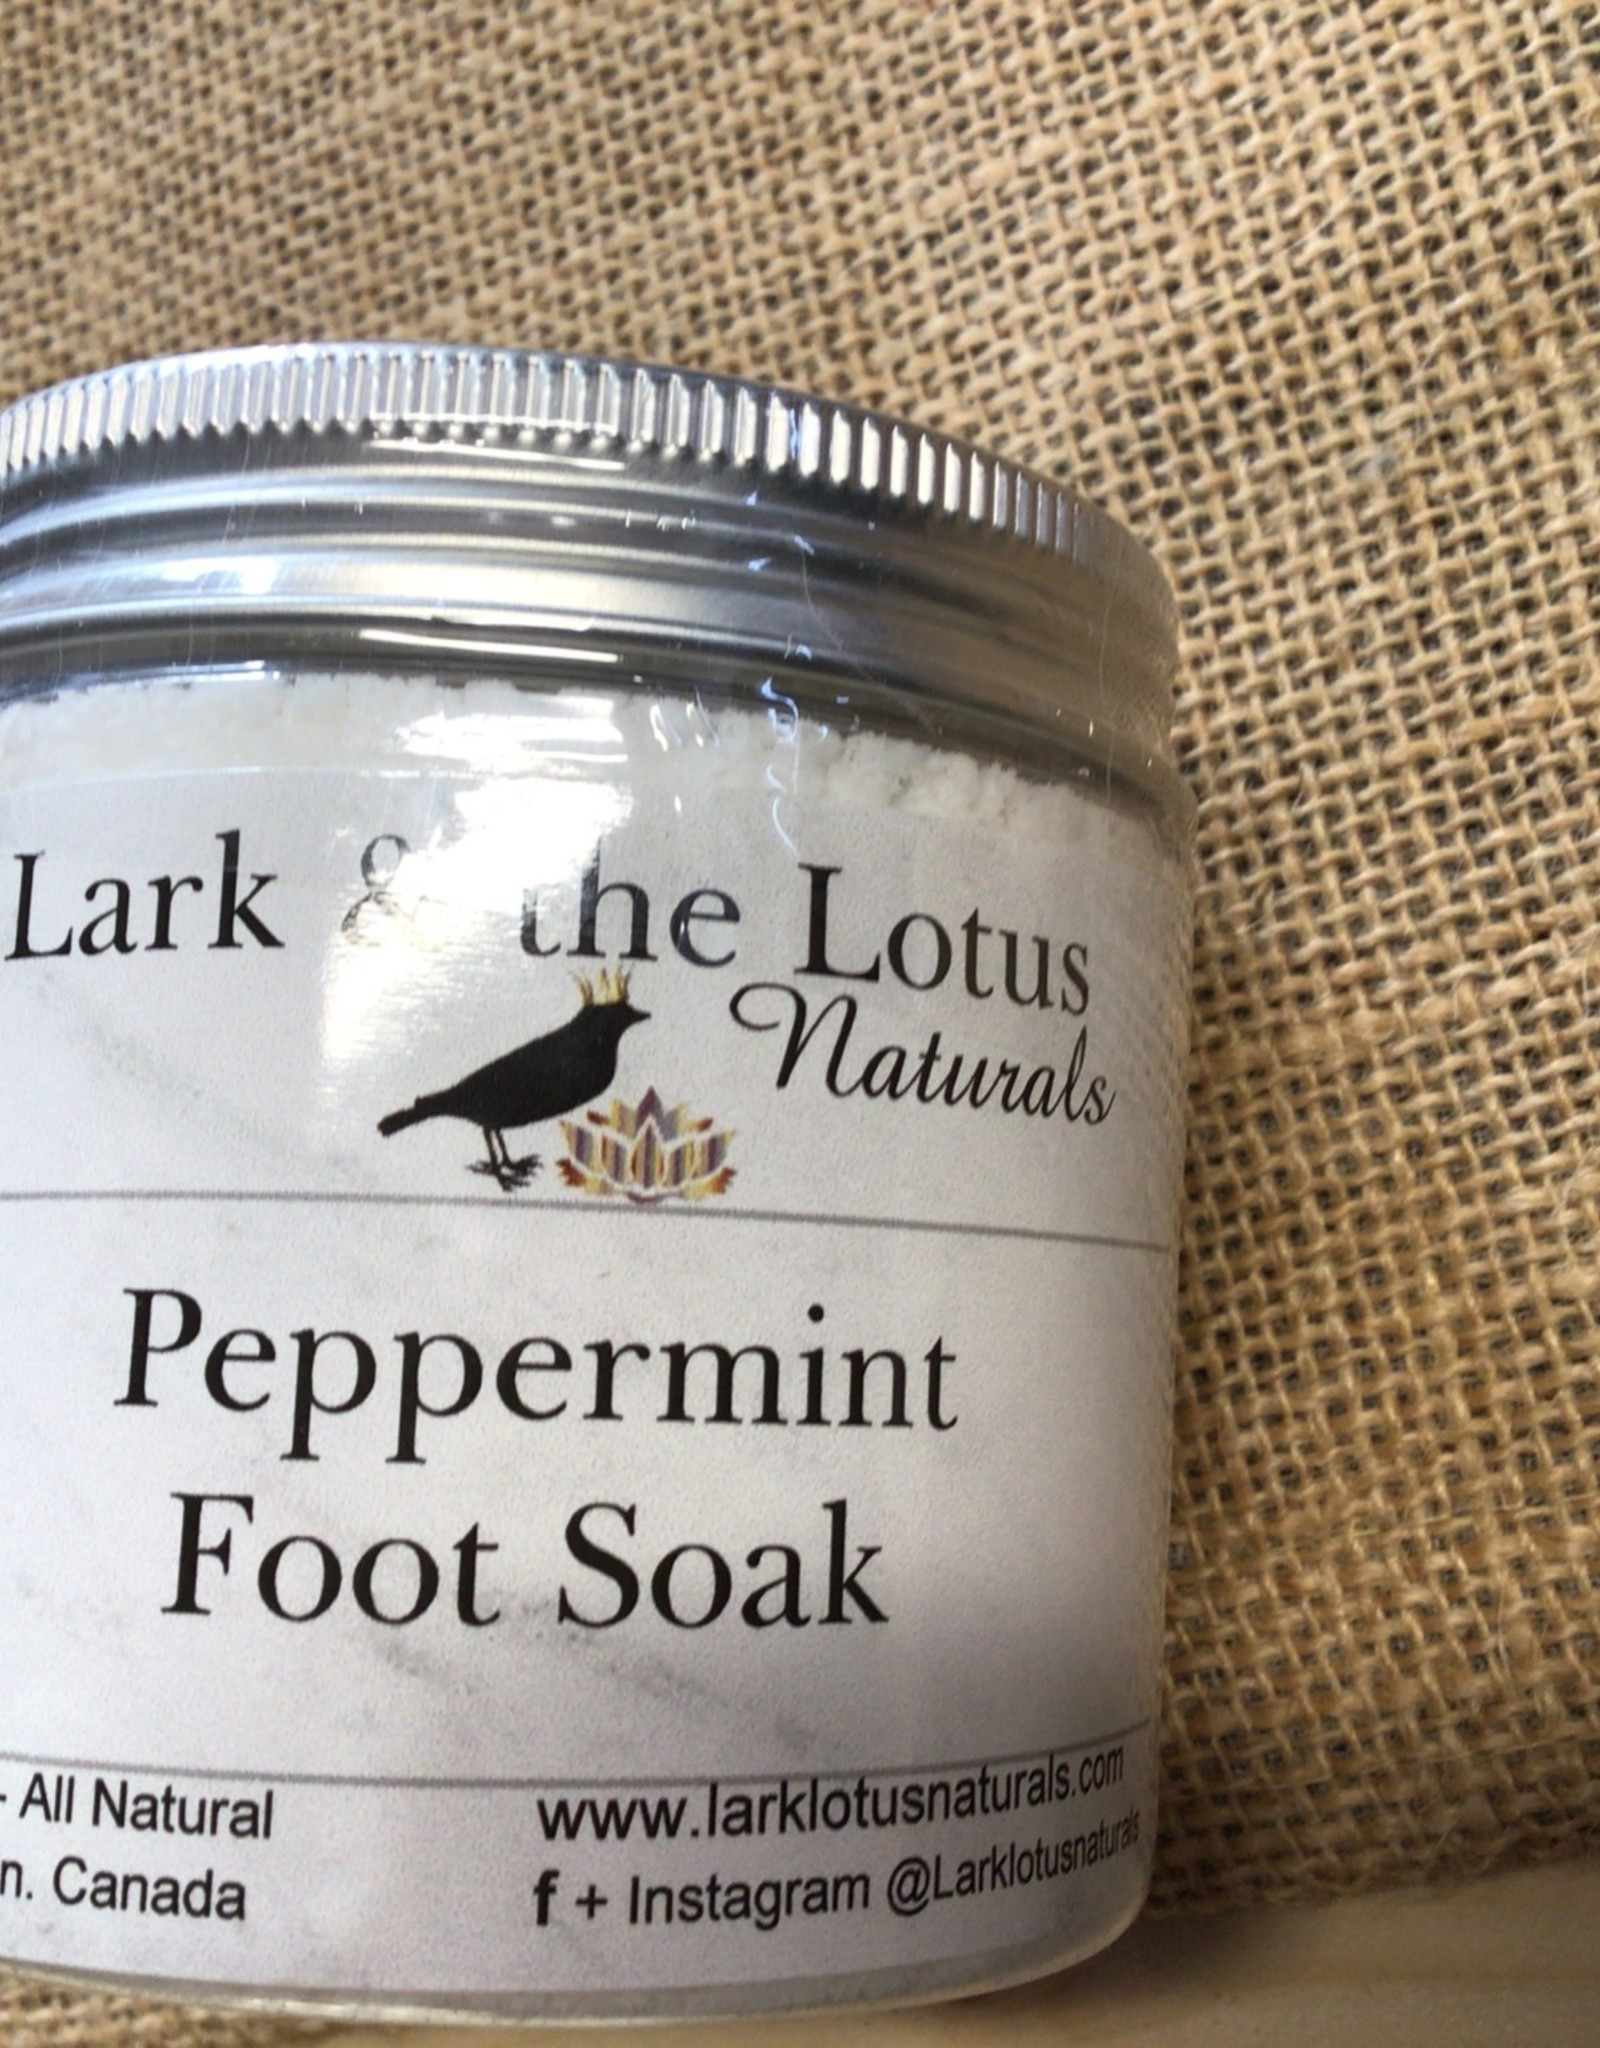 Lark & Lotus Peppermint Foot Soak